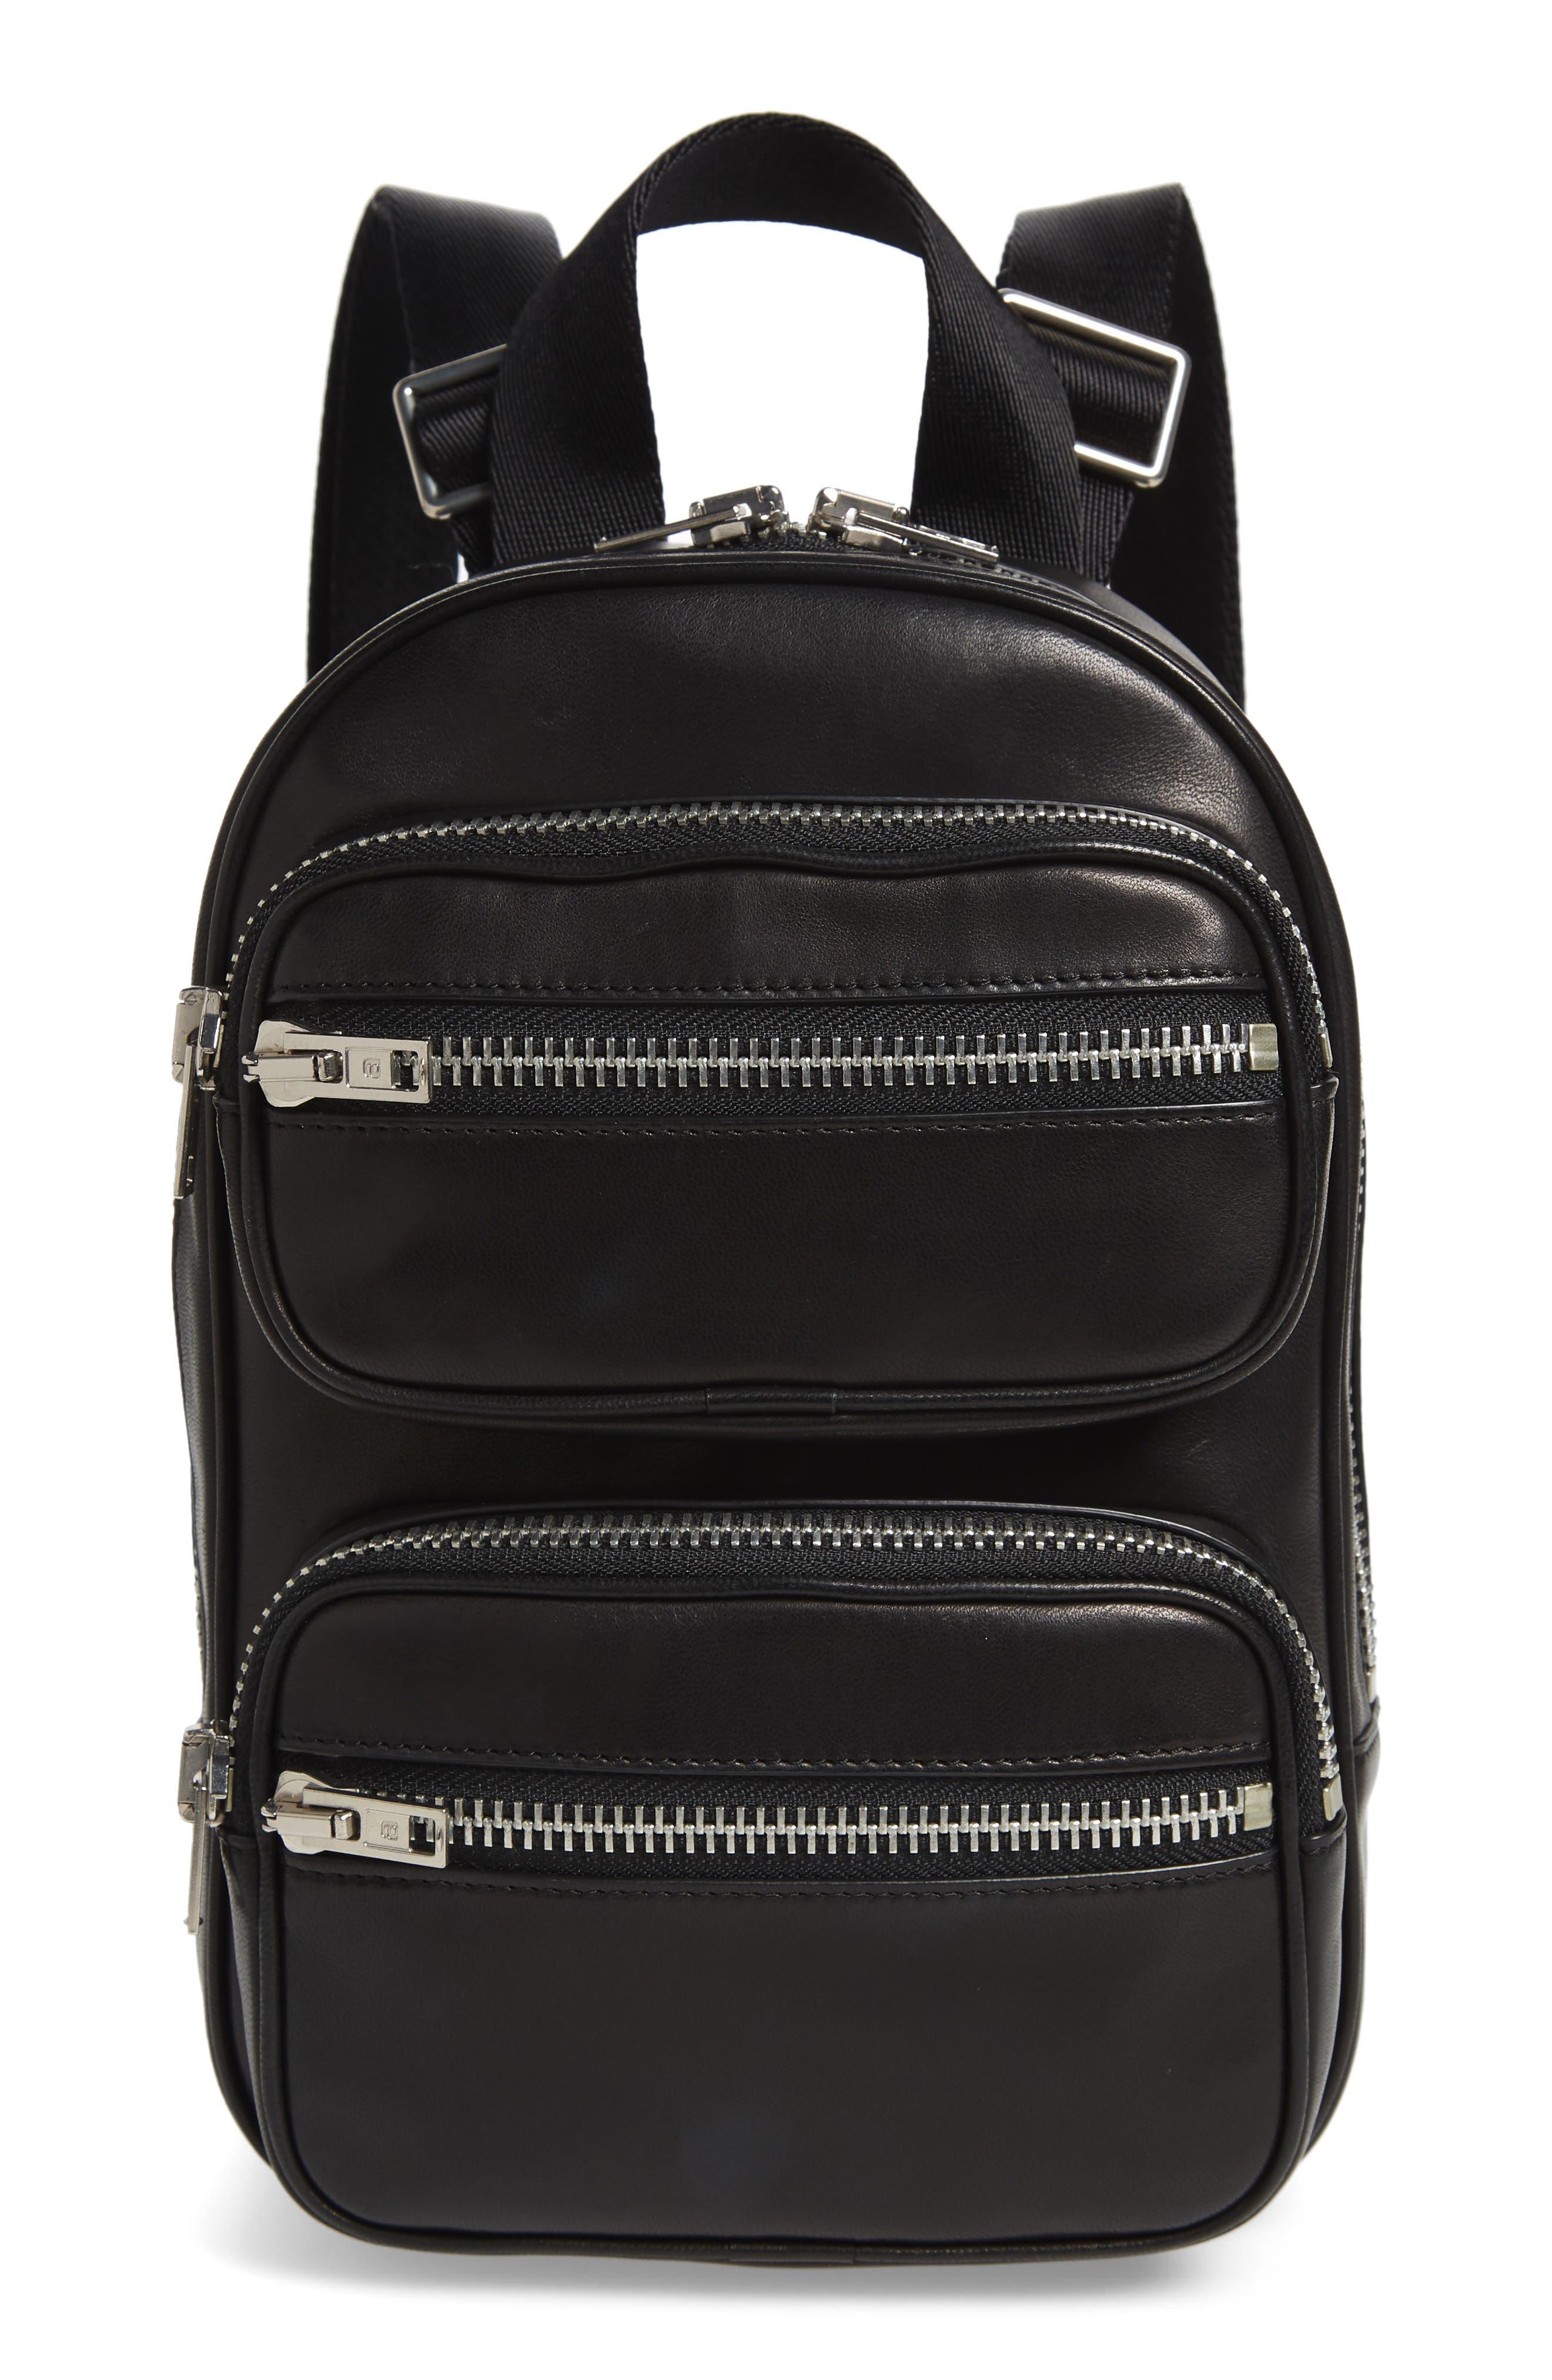 ALEXANDER WANG, Attica Lambskin Leather Backpack, Main thumbnail 1, color, BLACK